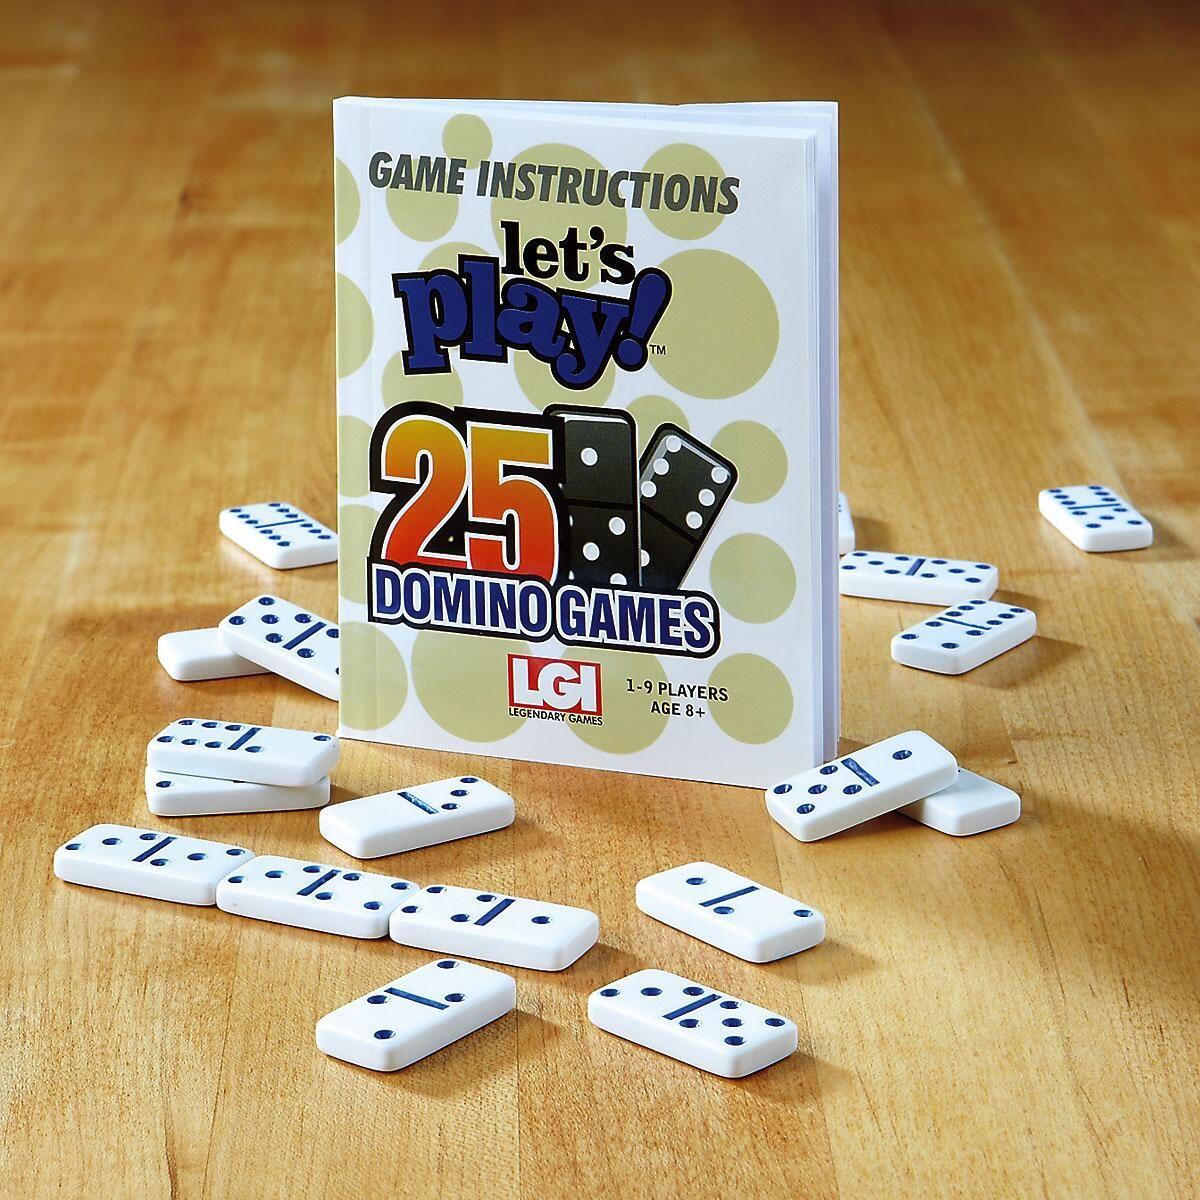 25 Domino Games